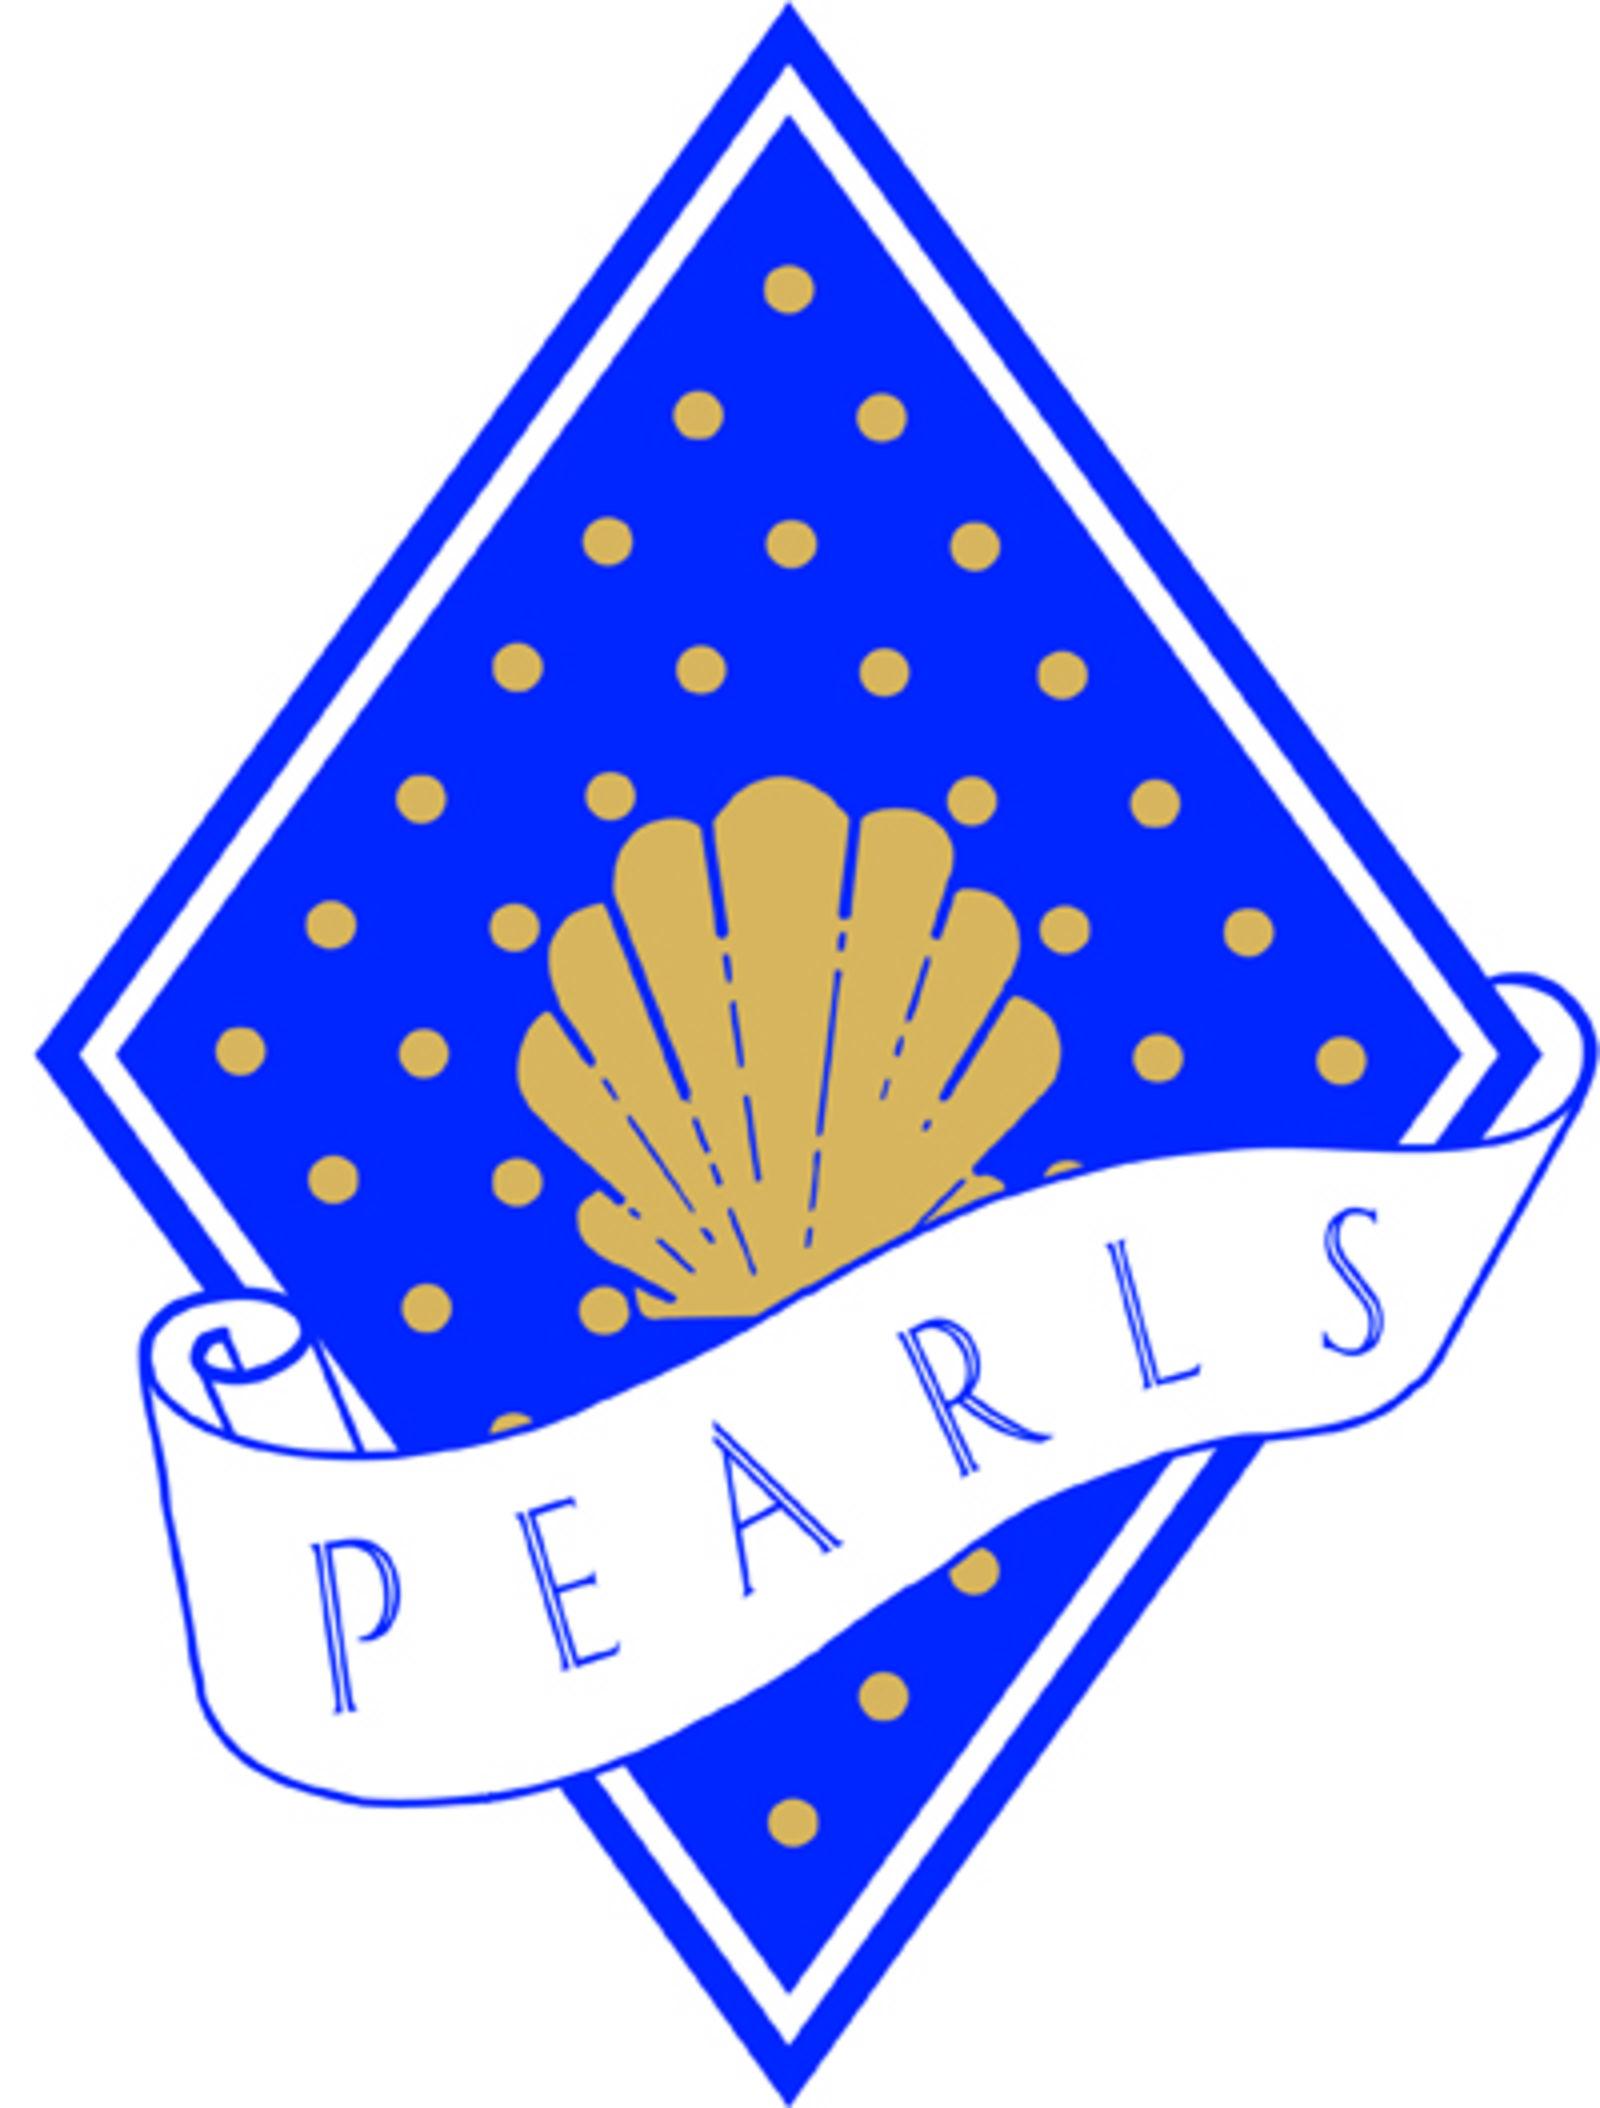 Pearls Women na Gütersloh (Bild 1)